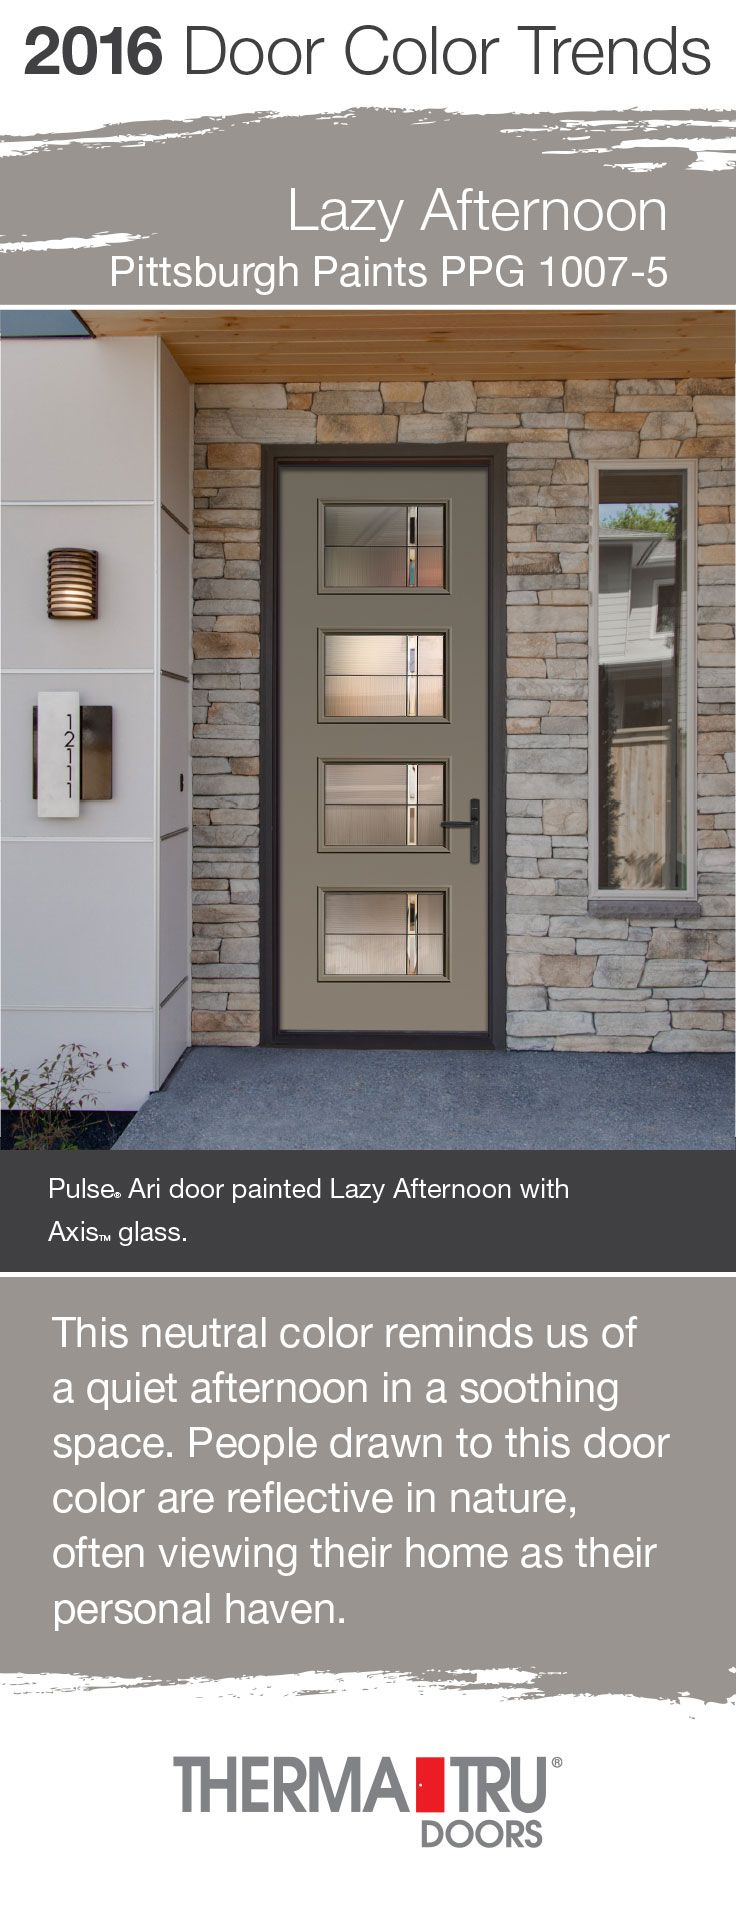 at blinds door video home tru doors sliding poster glass the hero in built begins open to therma with